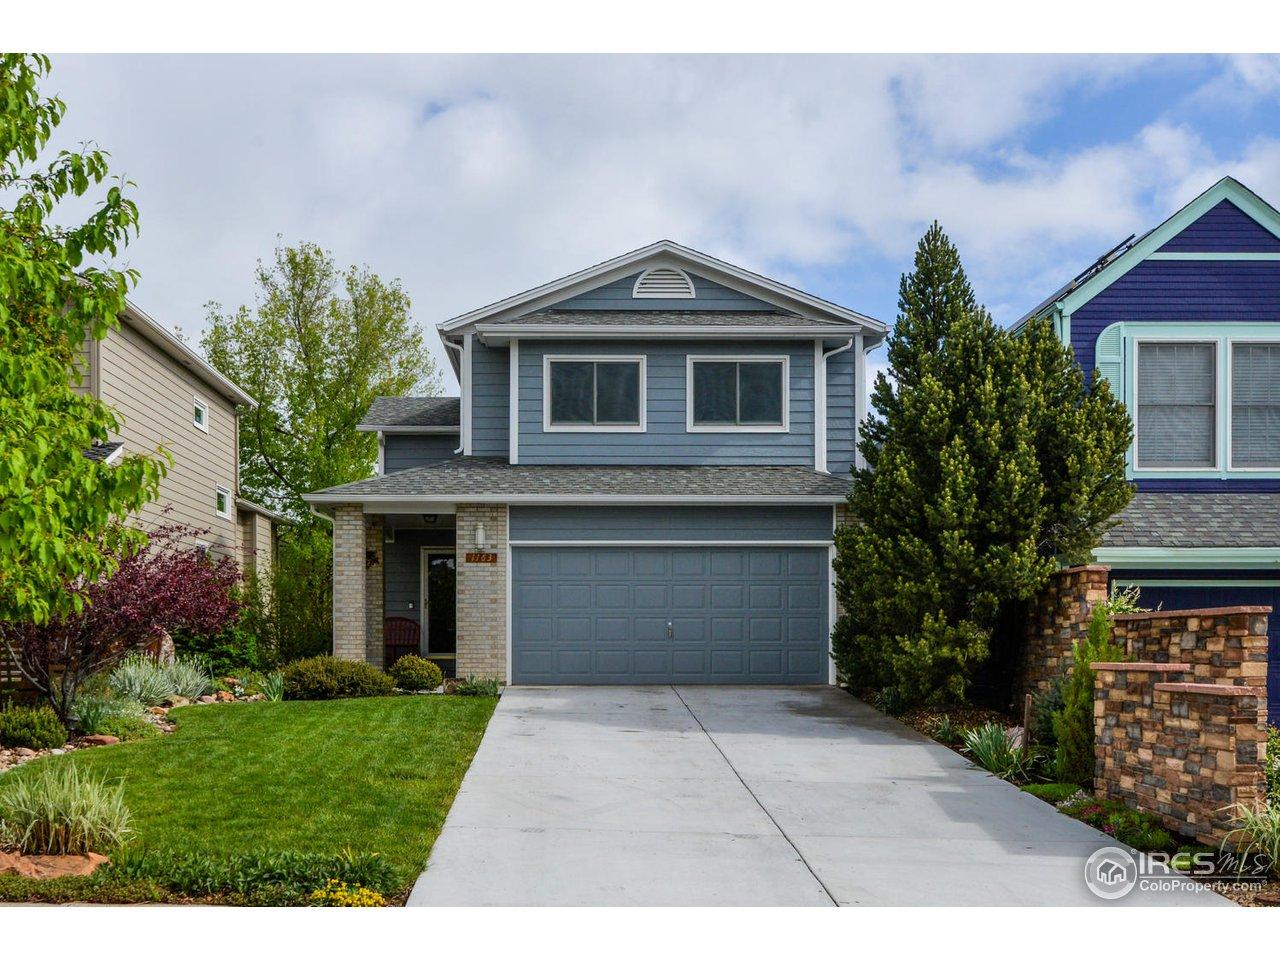 1163 Quince Ave, Boulder CO 80304